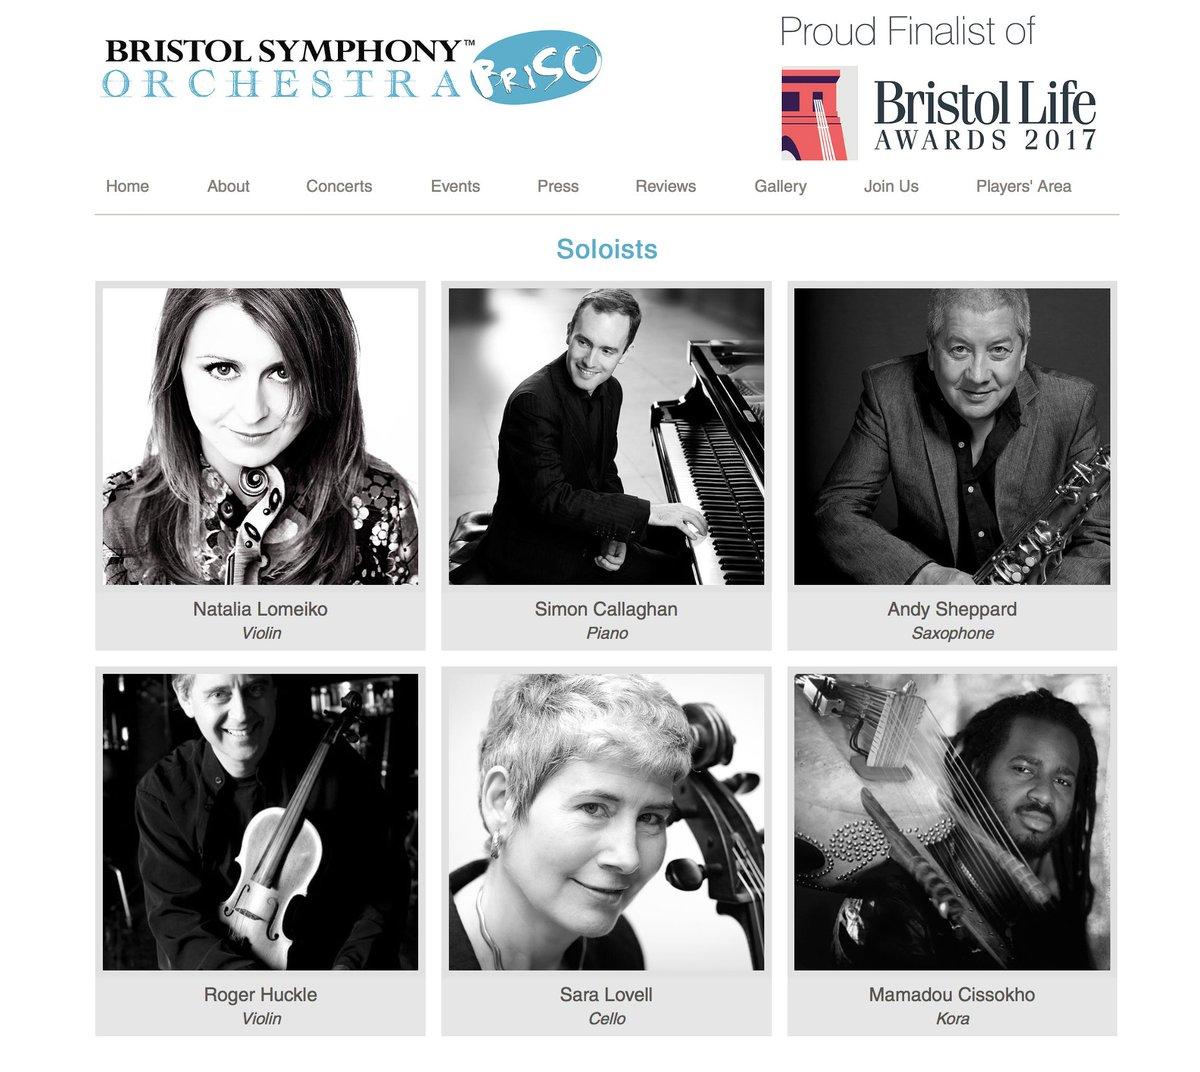 Our soloists:  http://www. bristolsymphonyorchestra.com/our-soloists  &nbsp;   #Soloist #Symphony #Orchestra #Bristol<br>http://pic.twitter.com/comvdVZJI8